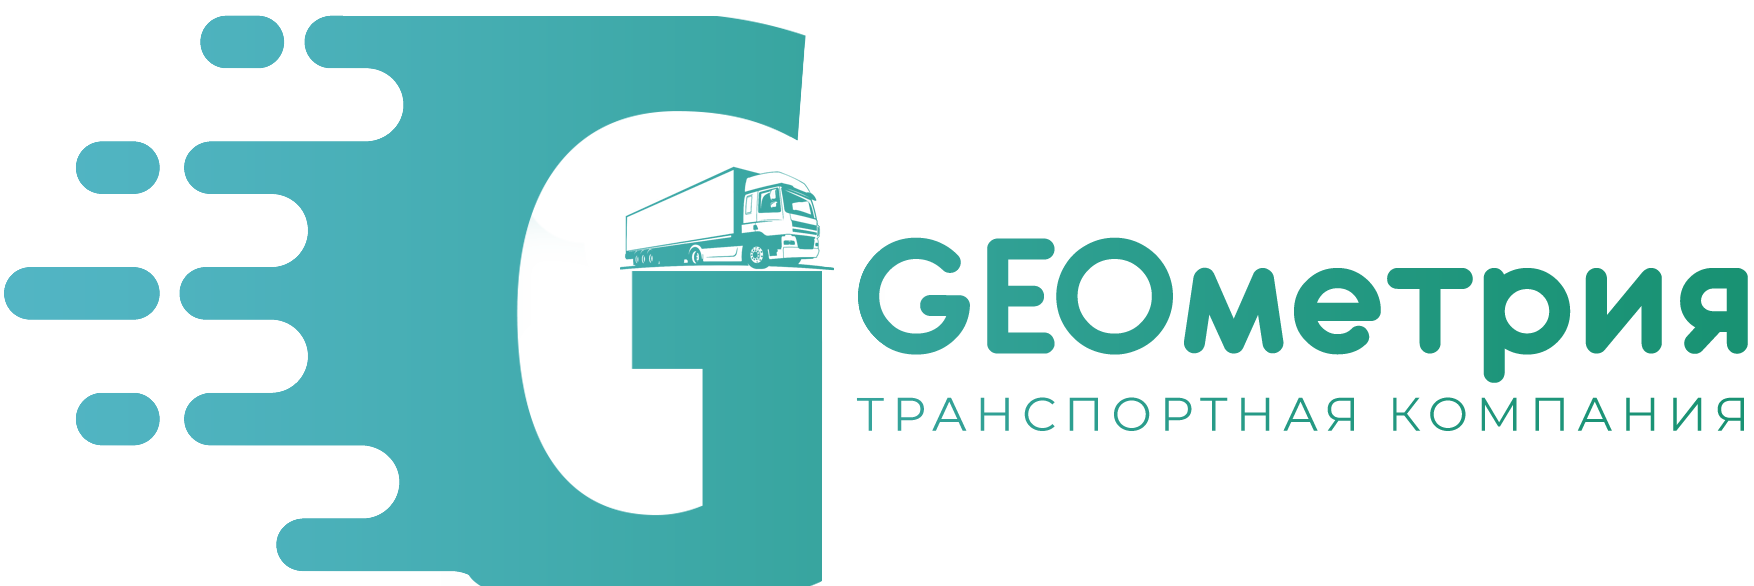 GEOметрия | Транспортная компания